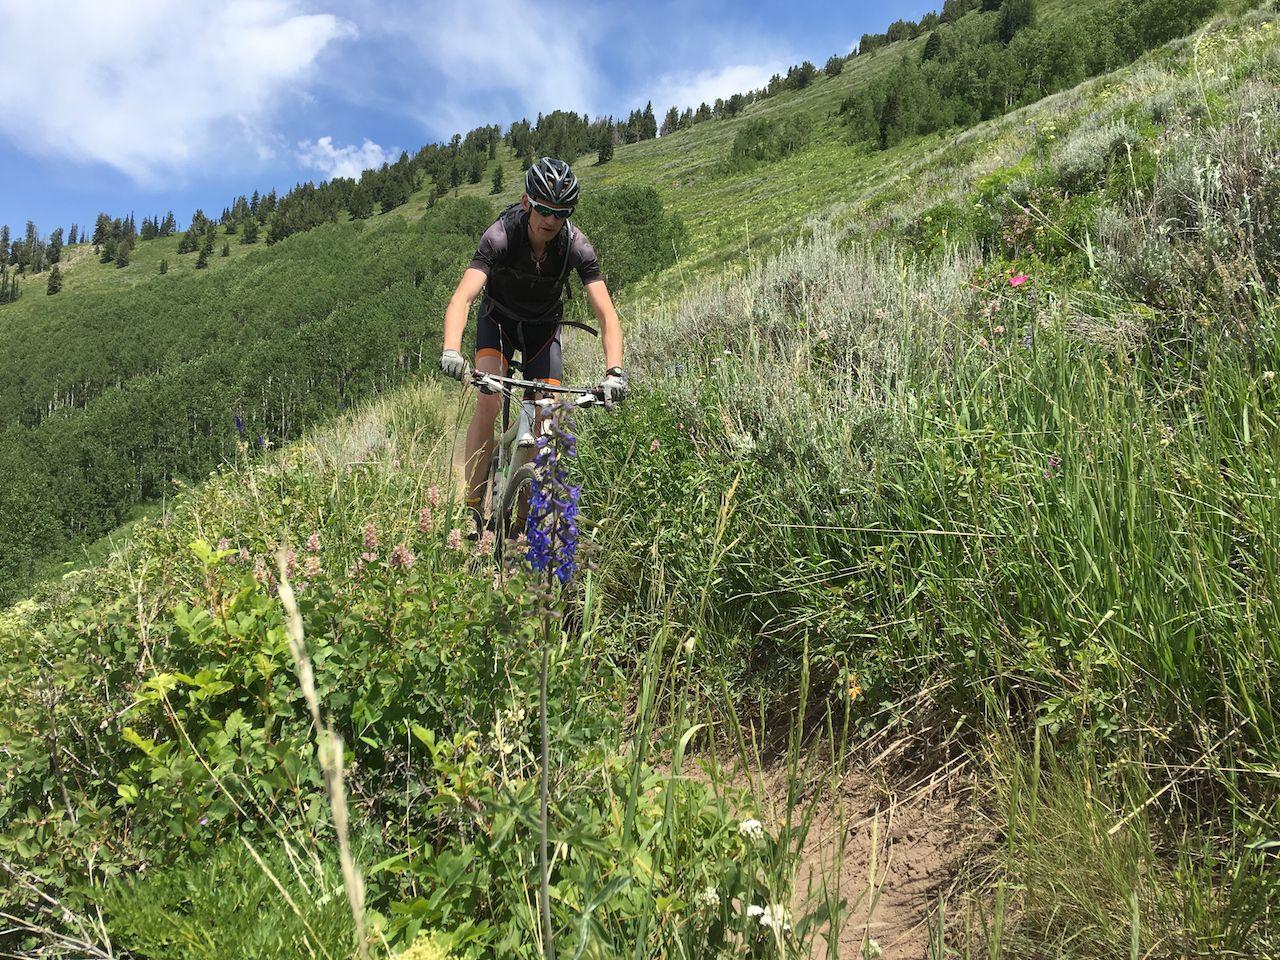 Cyclist riding through wildflowers